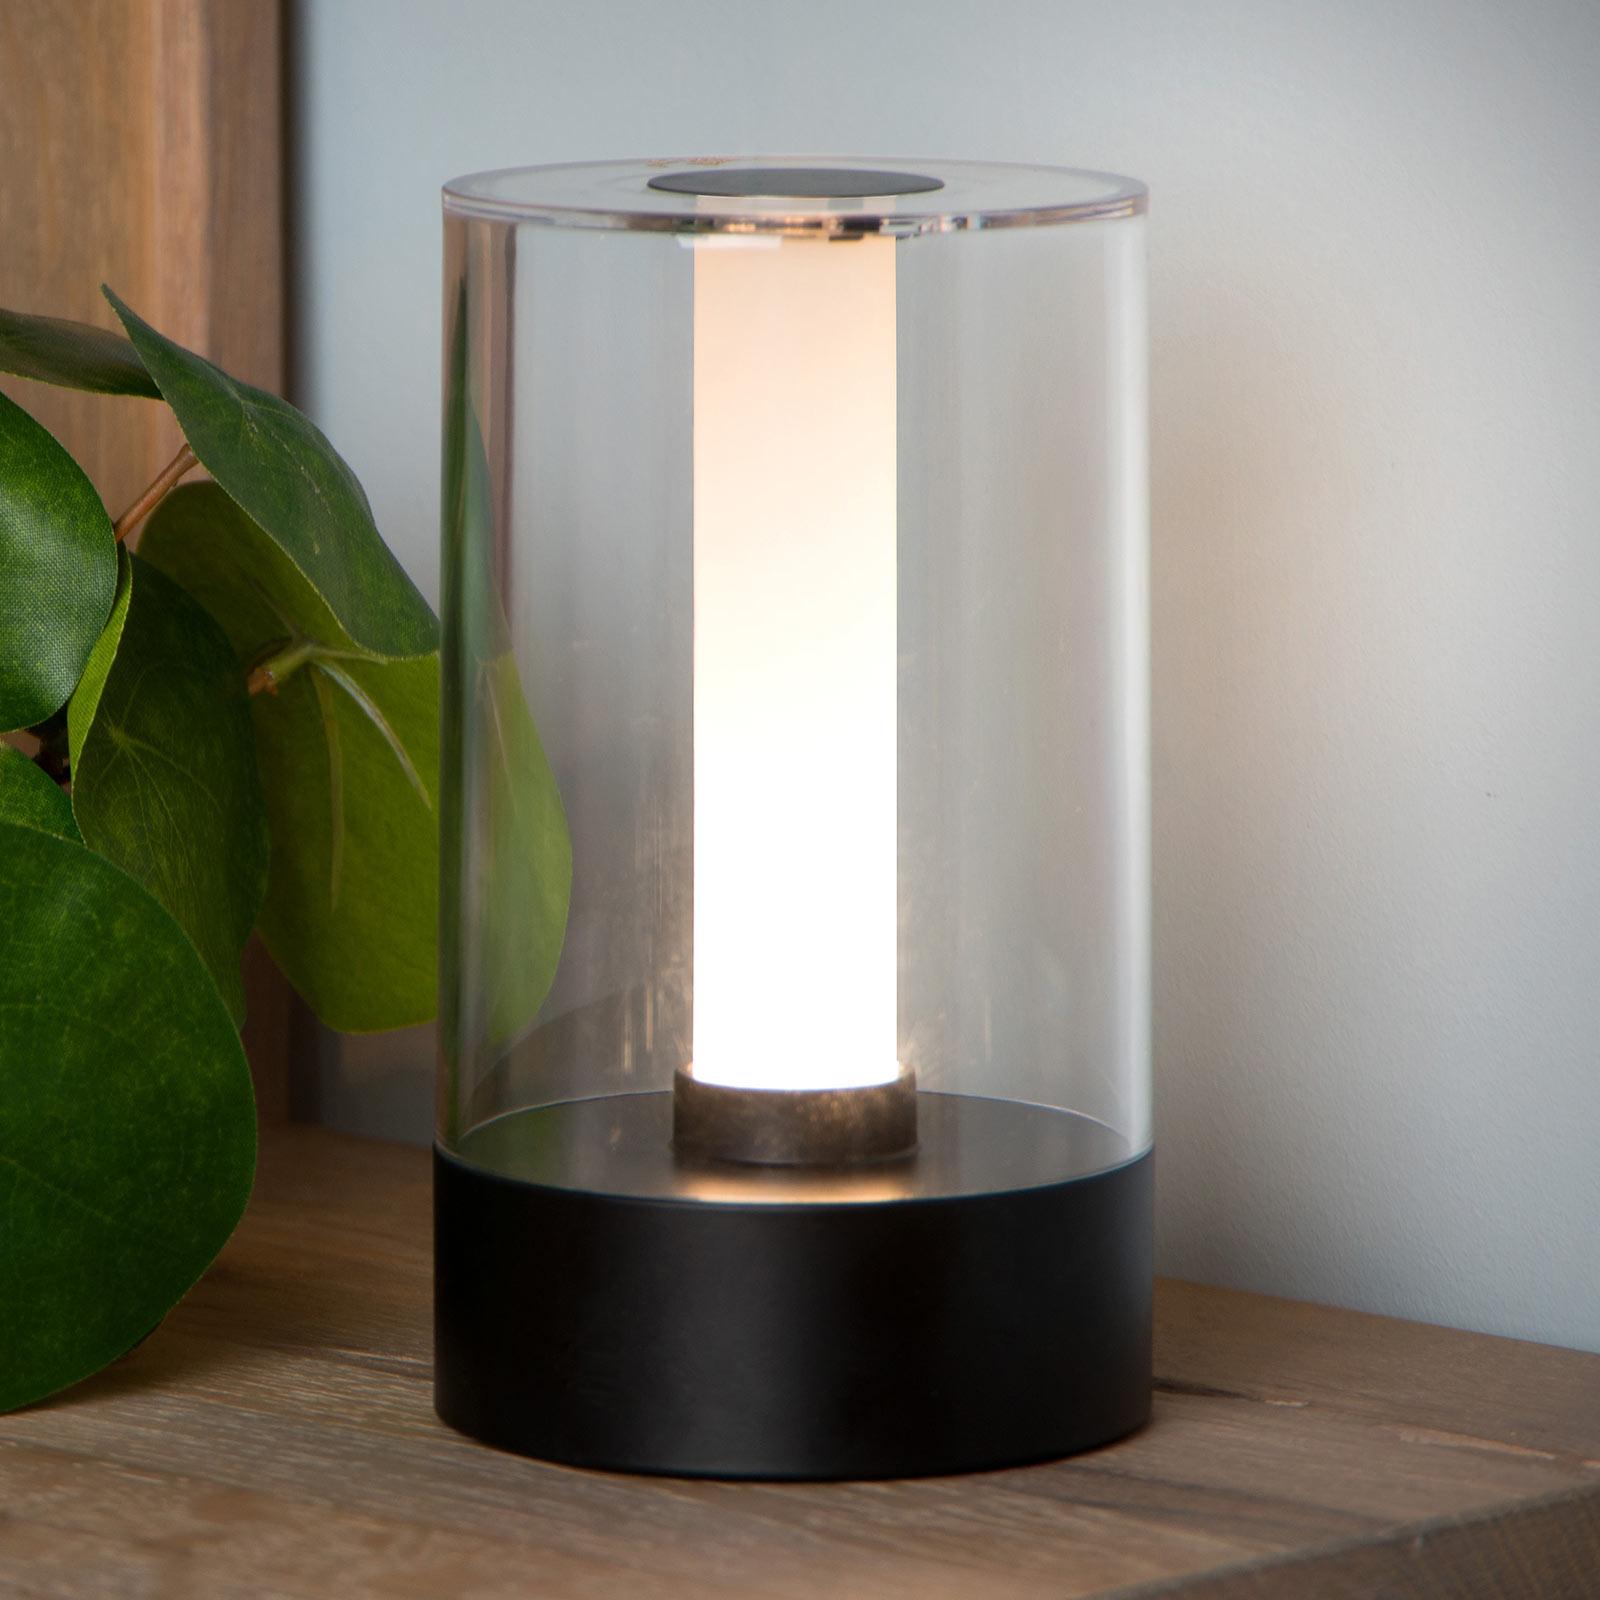 Tafellamp Tribun met accu en dimmer zwart